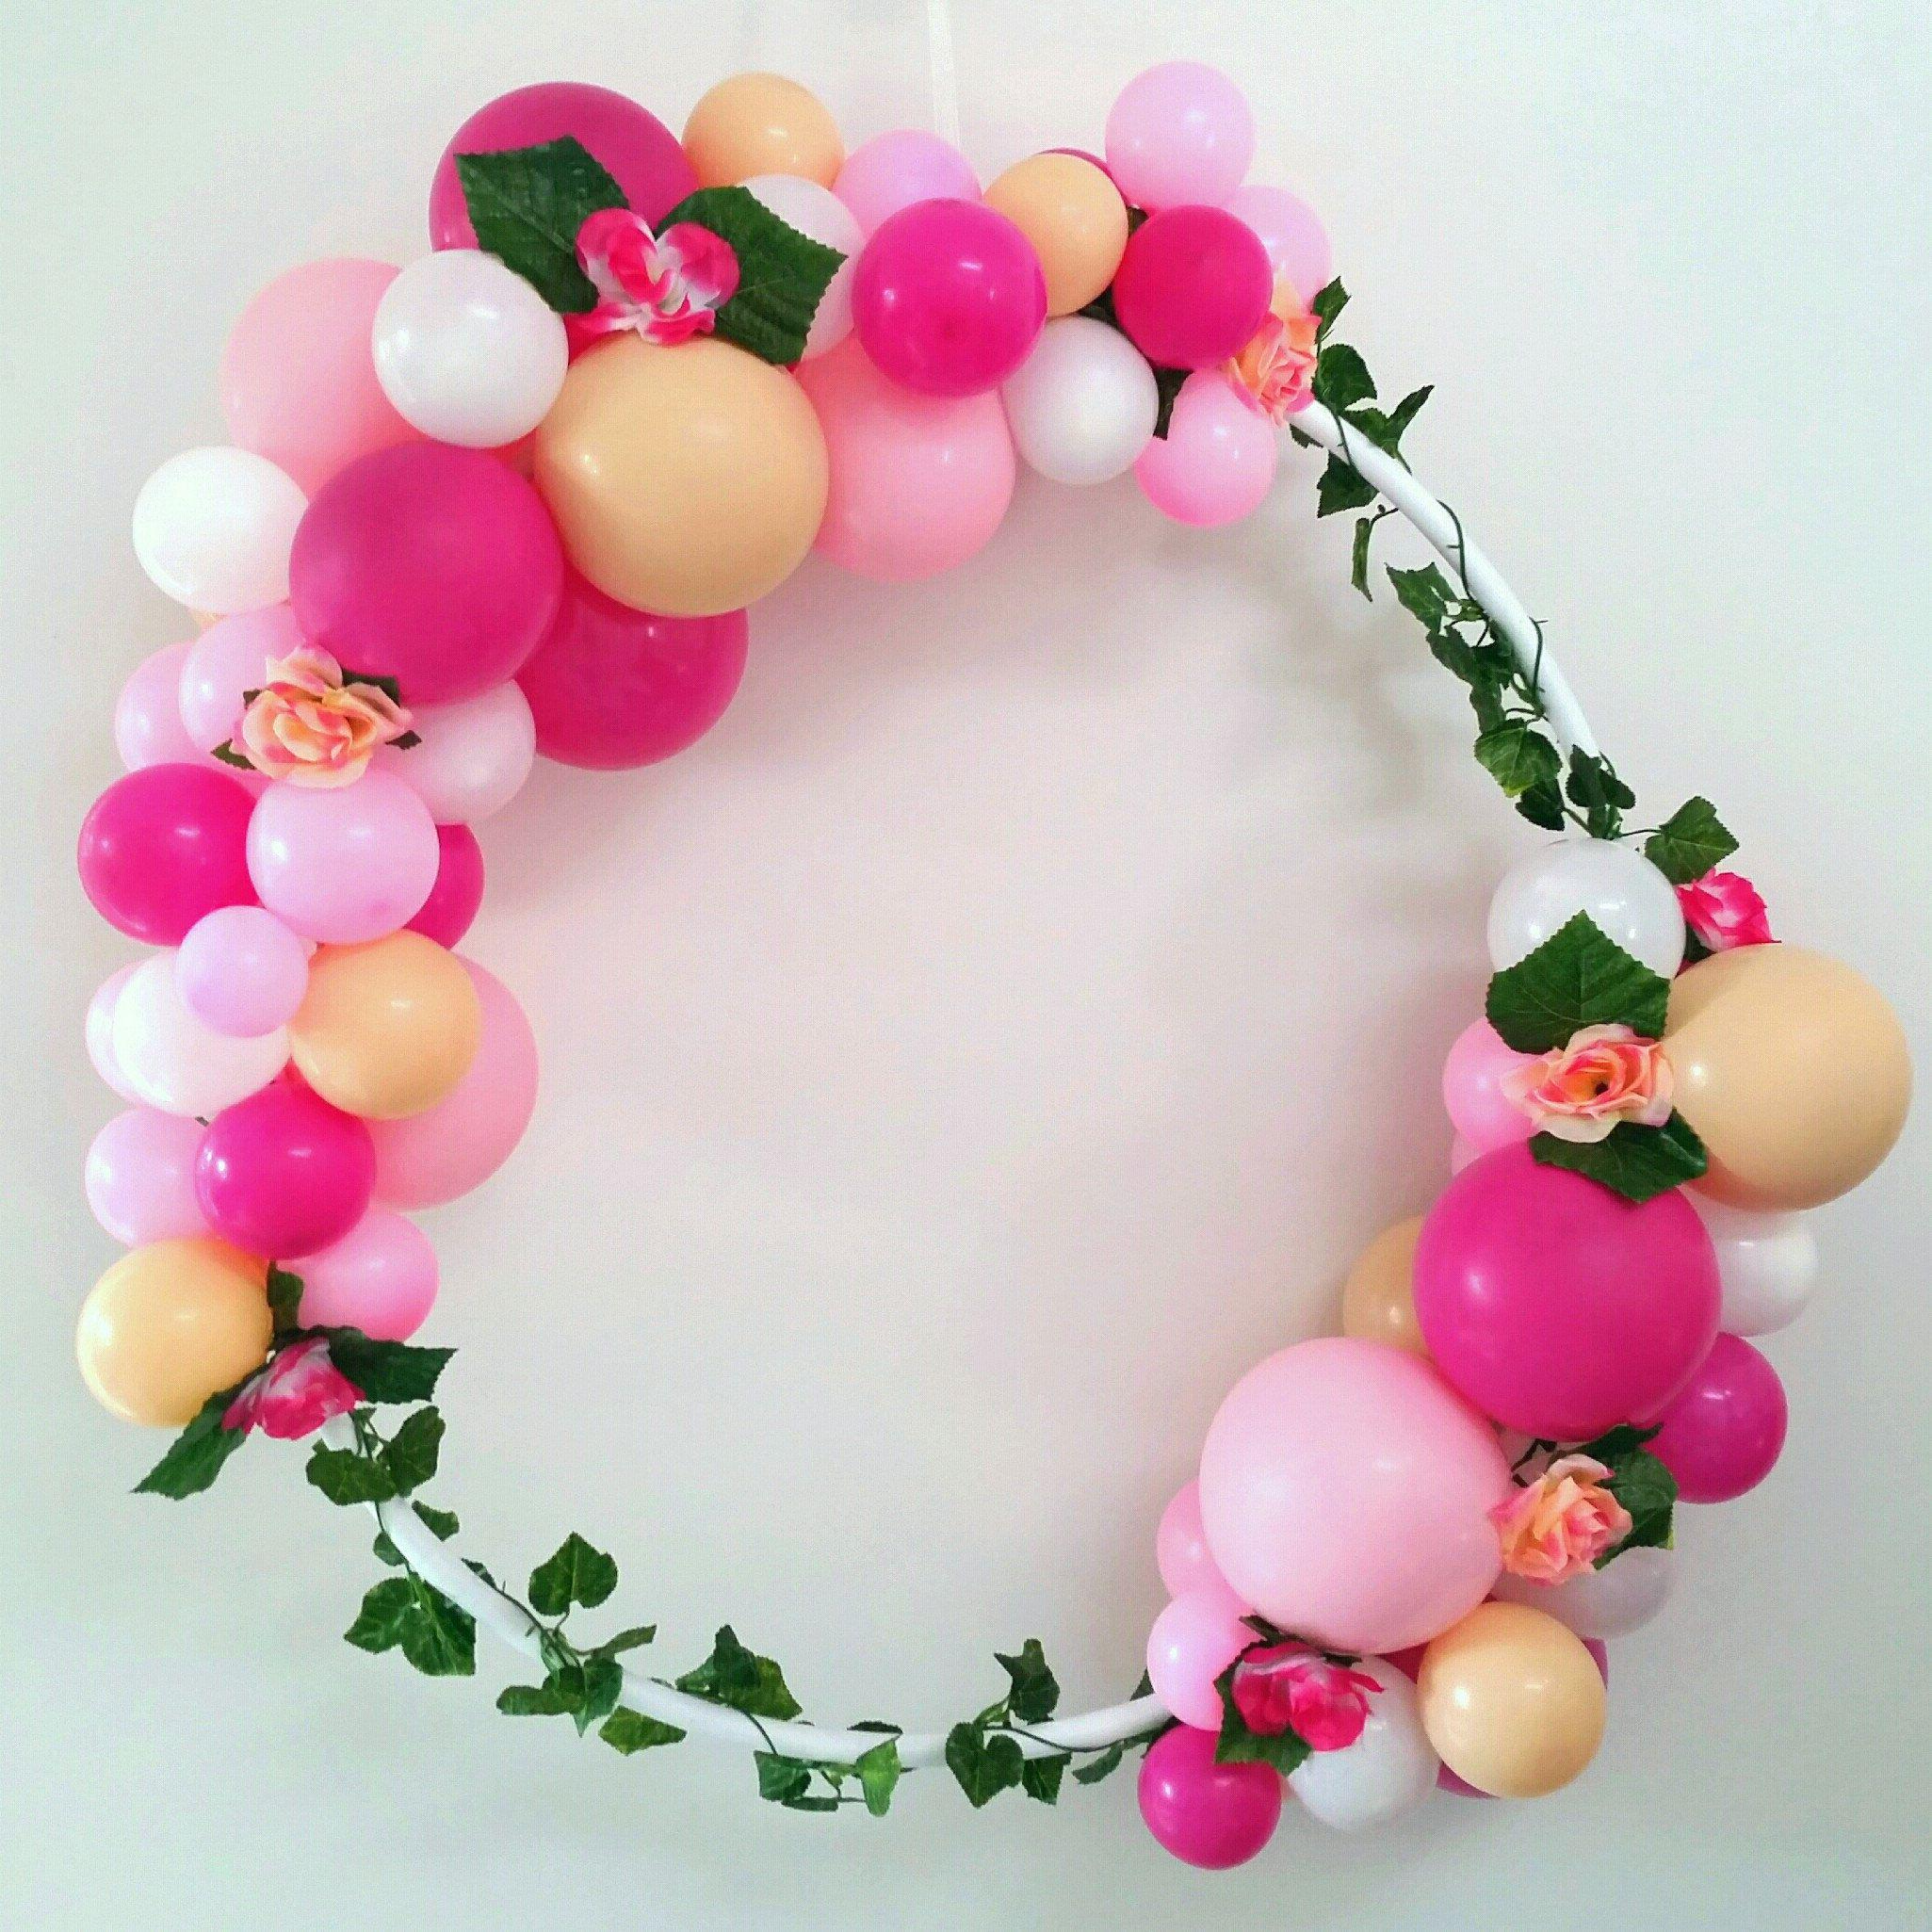 Balloon frame garland wreath hula hoop diy kit magenta pink nude decoracin new diy kit solutioingenieria Images